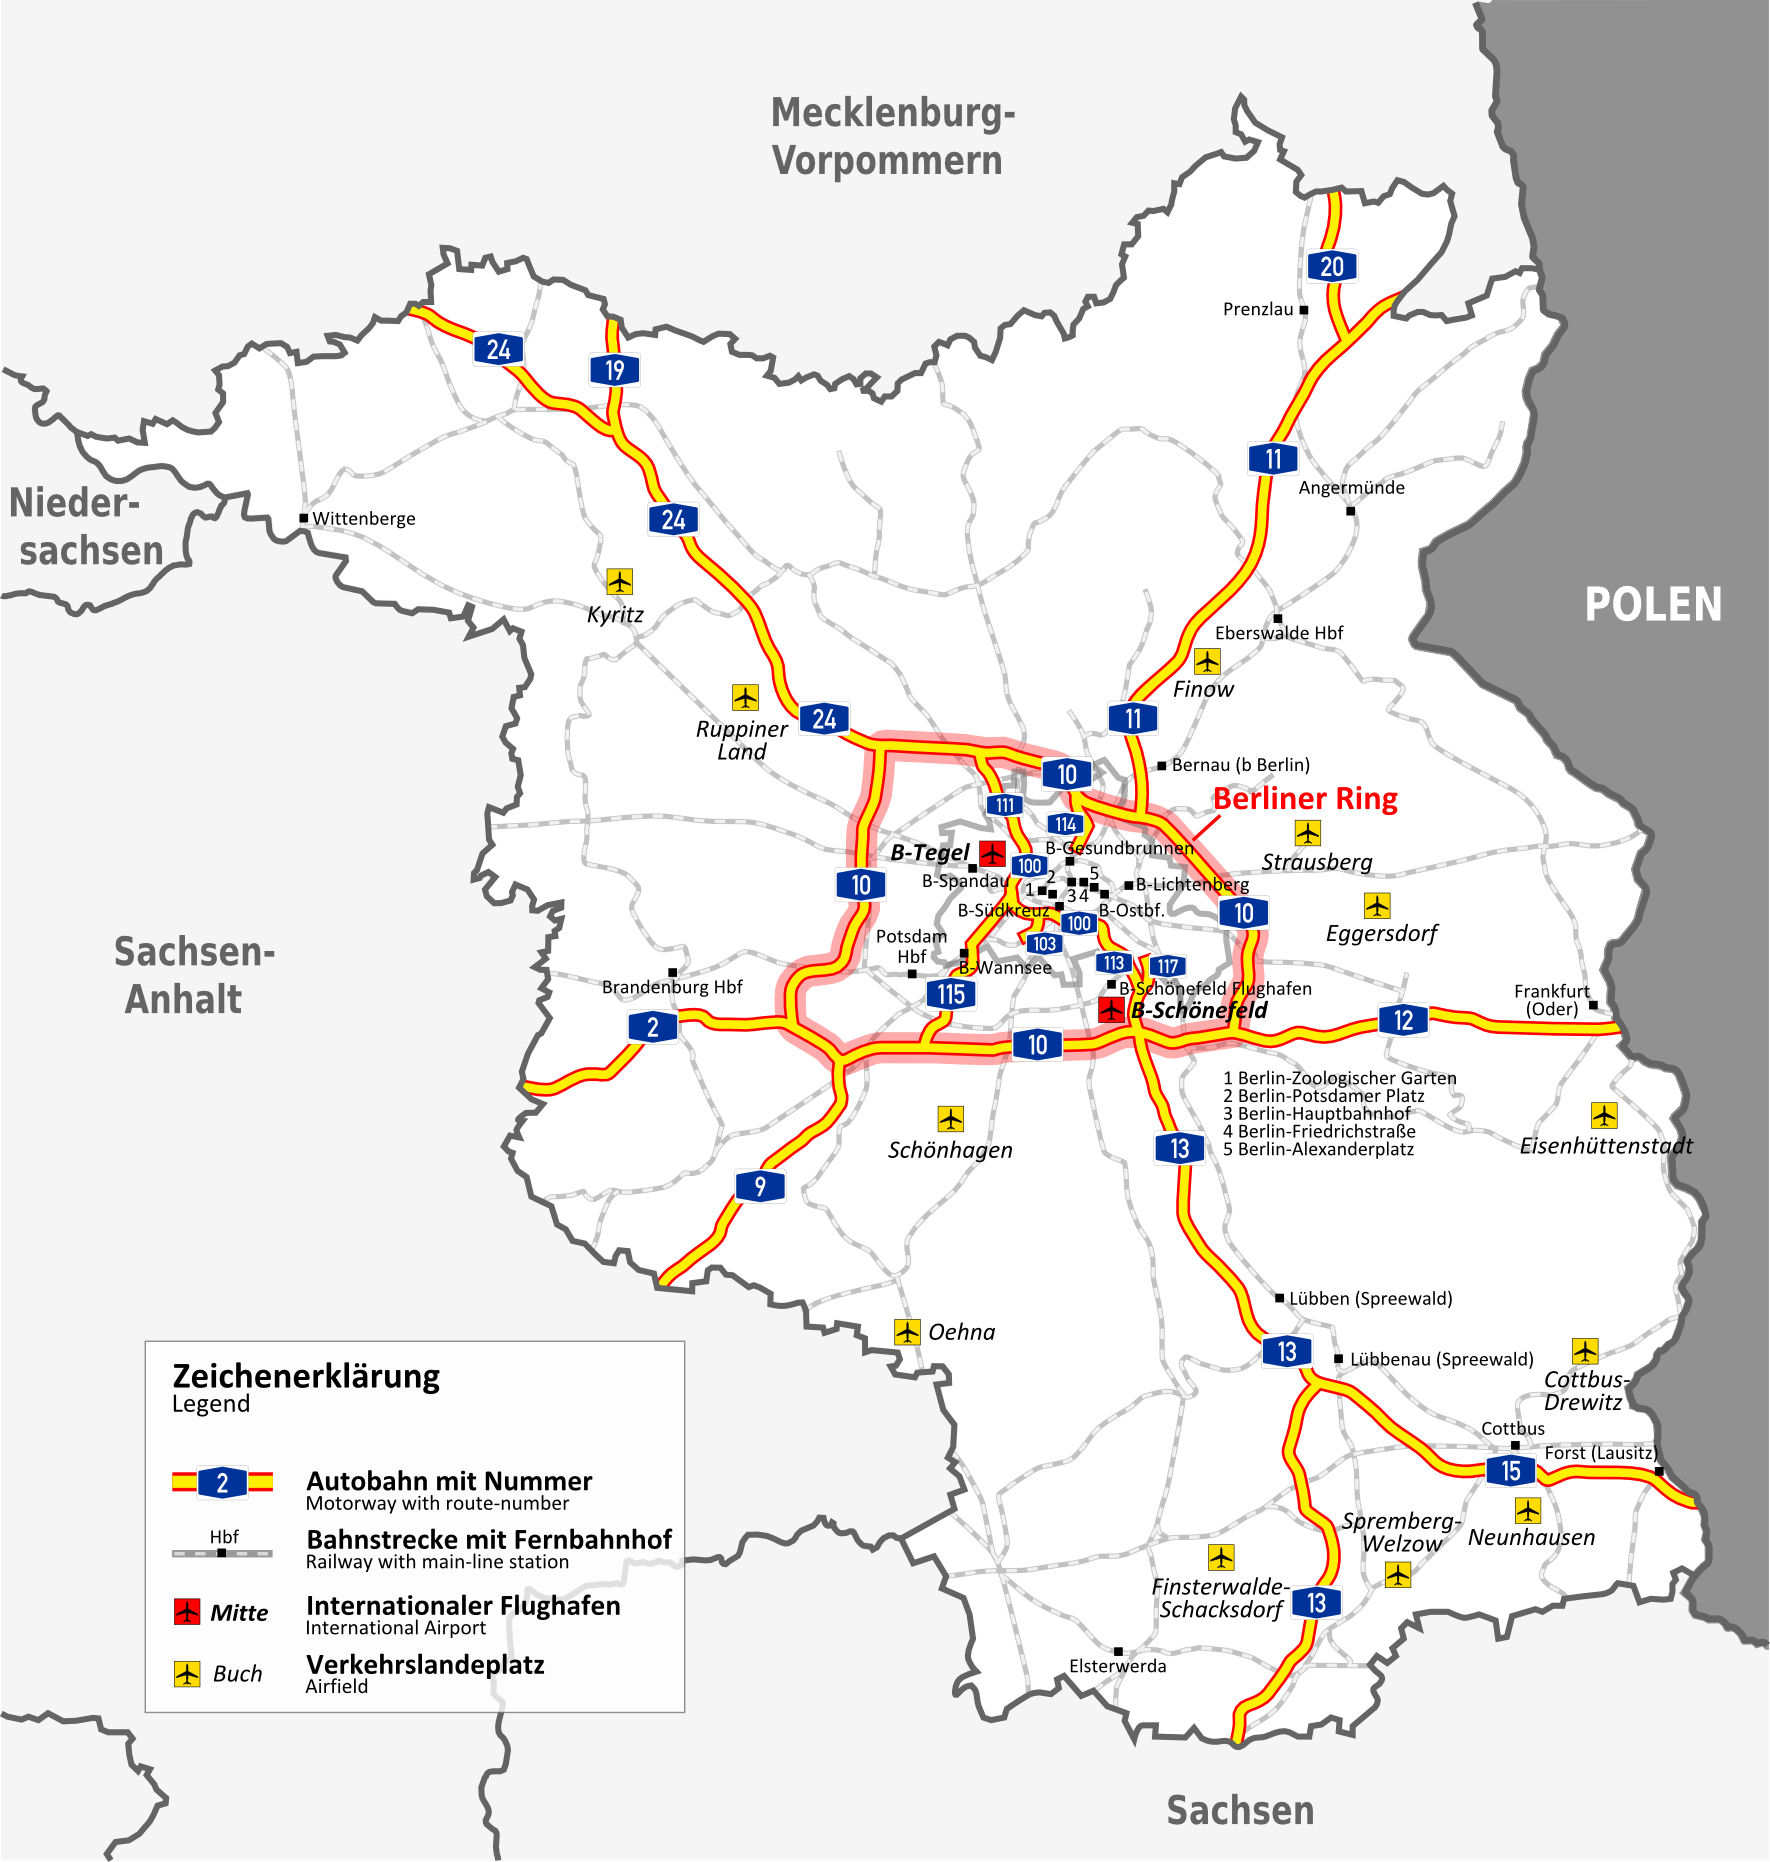 karte berlin brandenburg Datei:Karte Metropolregion Berlin Brandenburg Infrastruktur.png  karte berlin brandenburg